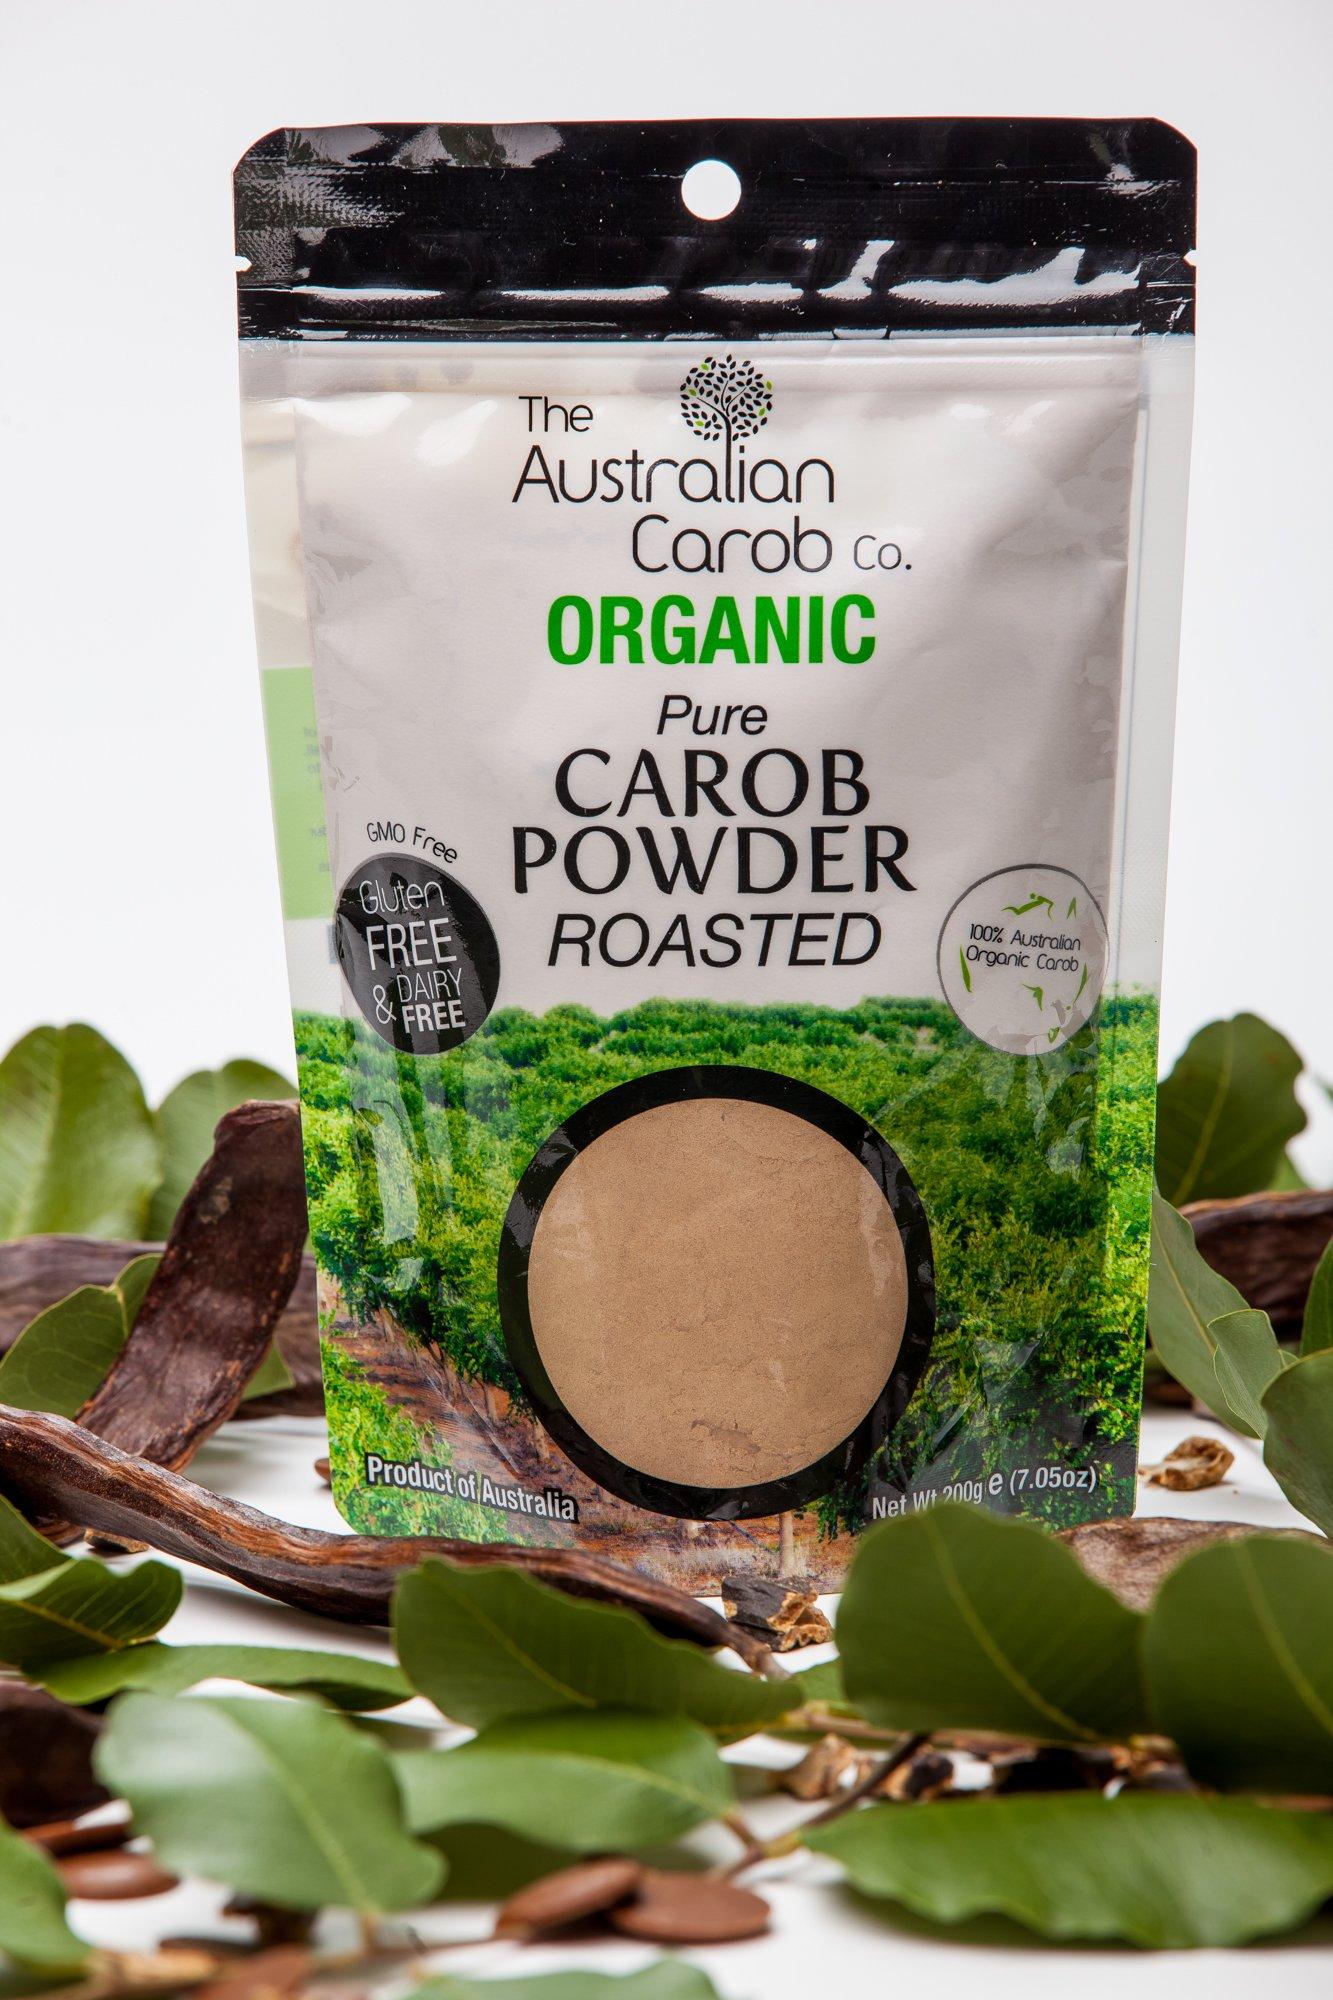 ORGANIC AUSTRALIAN CAROB CO. PREMIUM ROASTED CAROB POWDER, RE-SEALABLE BAG, SUPERFOOD, PALEO, NON-GMO, WORLD'S #1 BEST TASTING, VEGAN, ORGANIC CAROB POWDER, CAROB, CAROB BAR, 7.05oz.